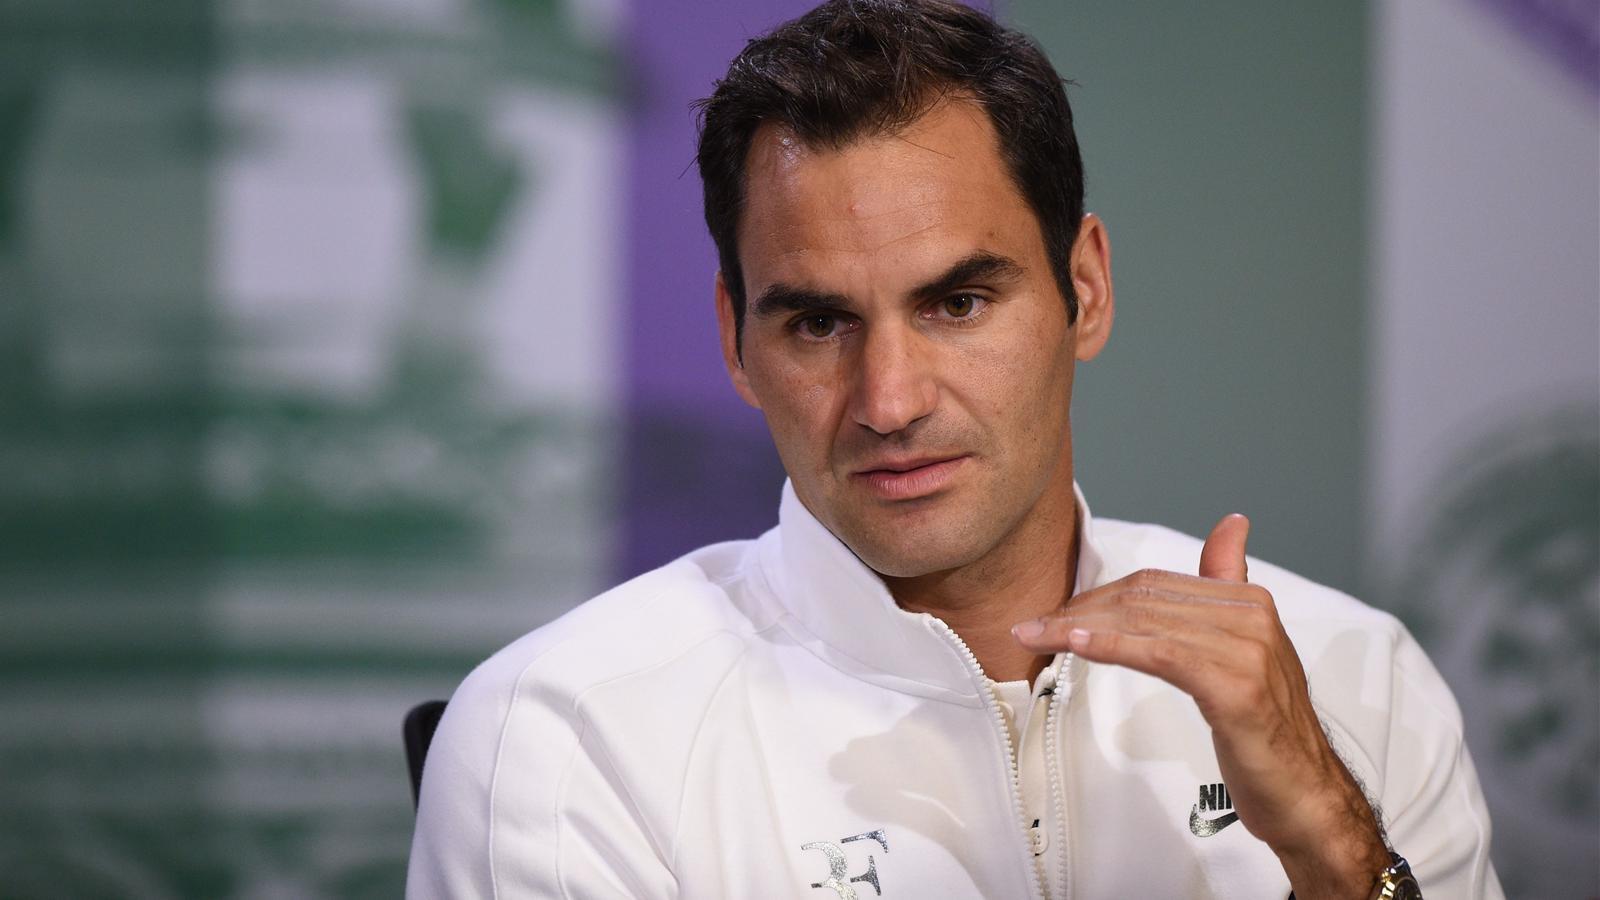 A quand la retraite ? Federer n'a